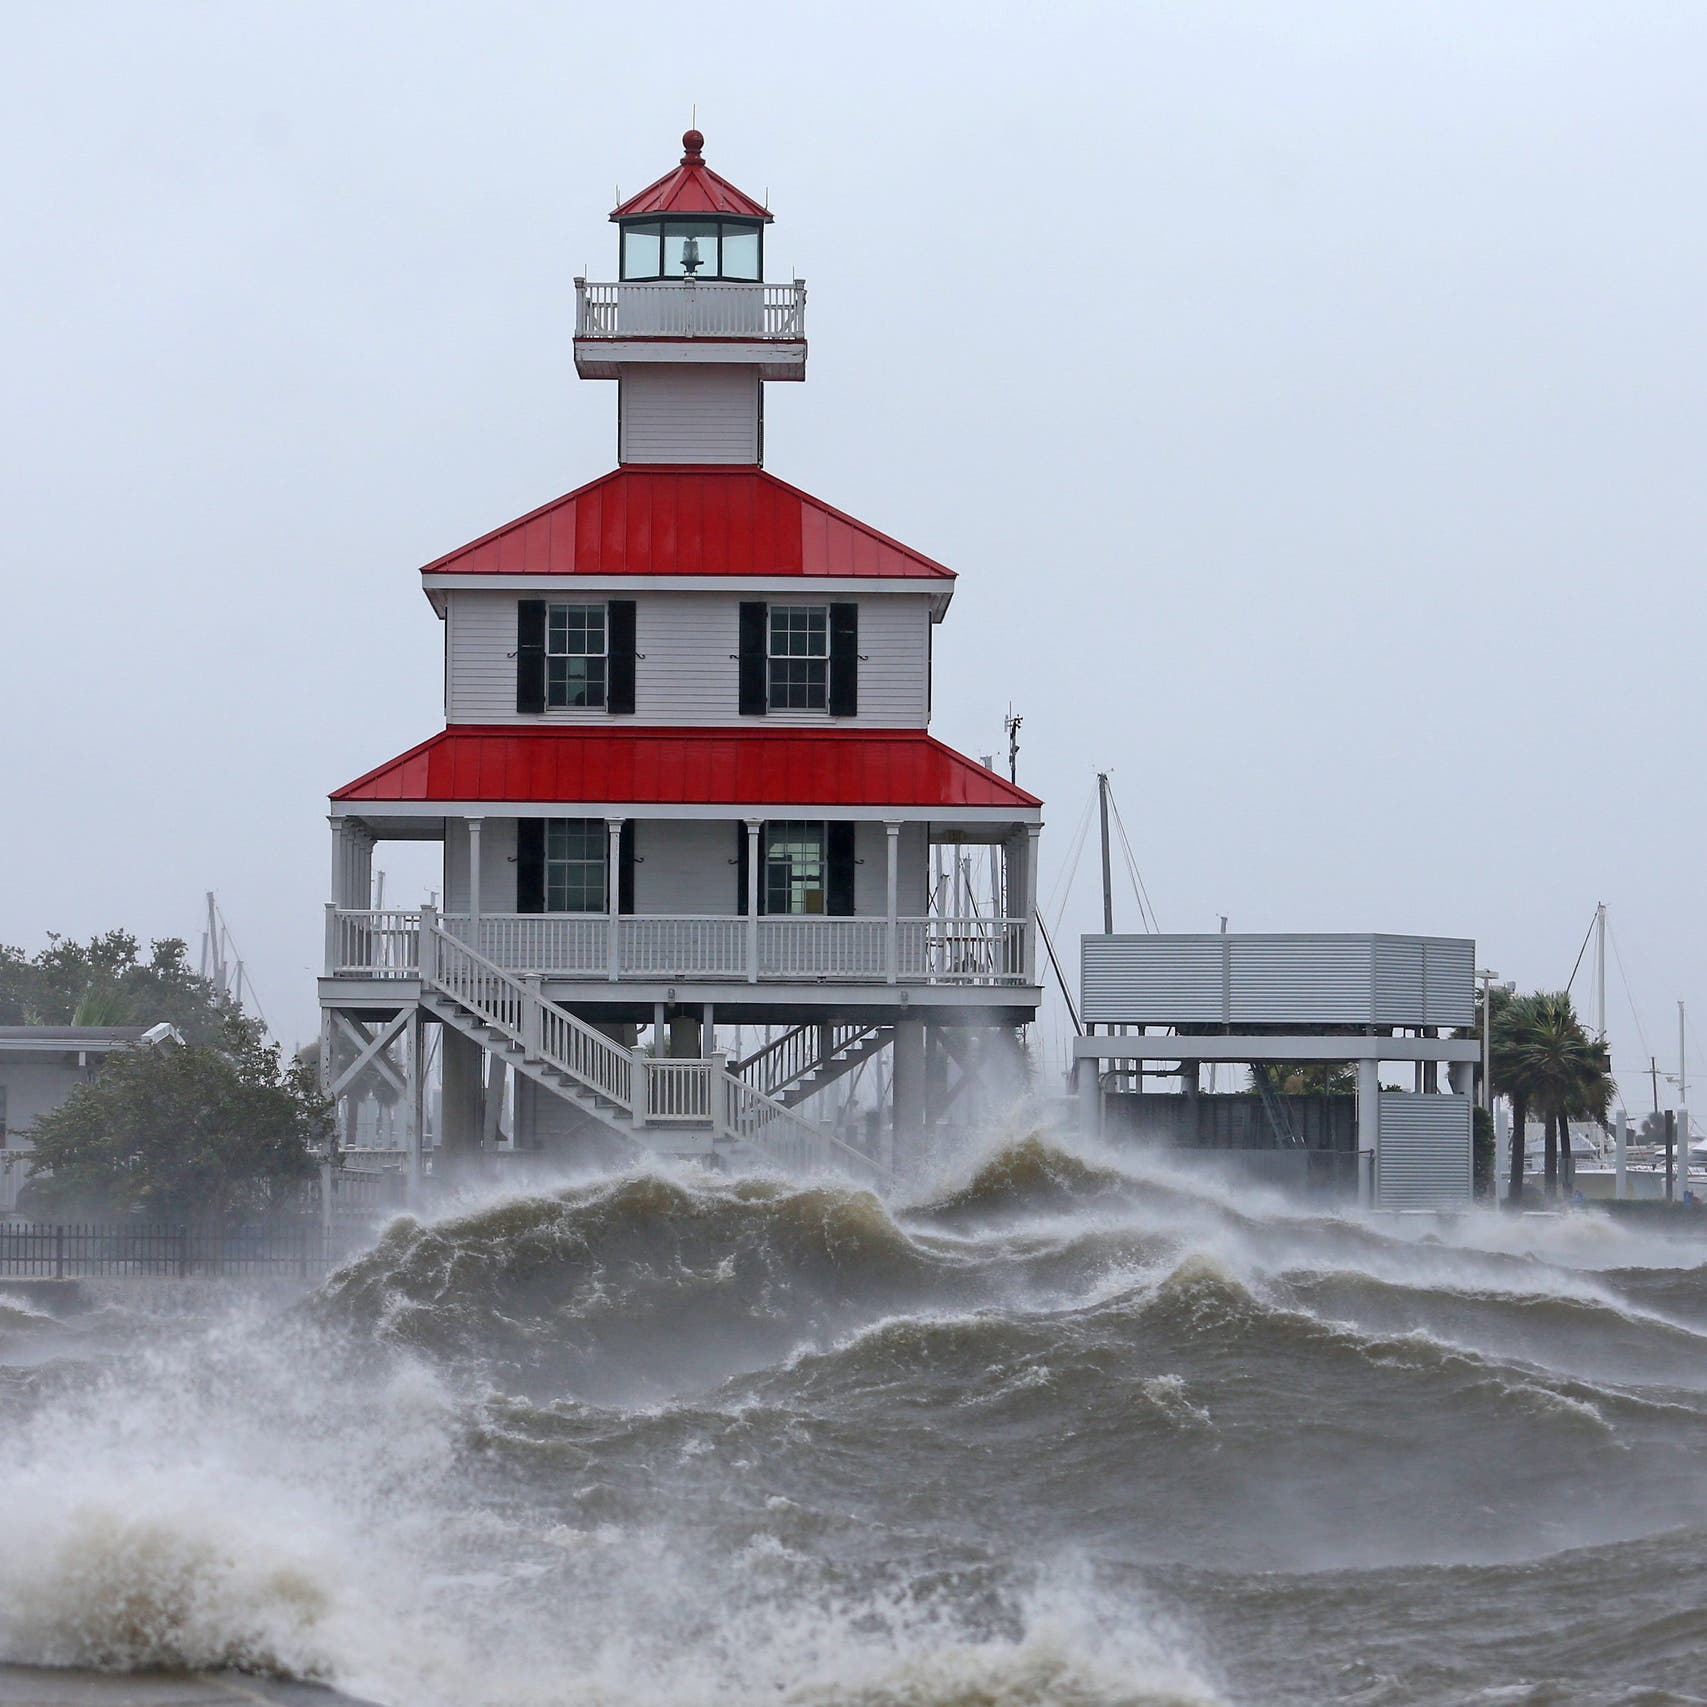 Giant Hurricane Ida strikes US shoreline, forces Mississippi river to flow backwards